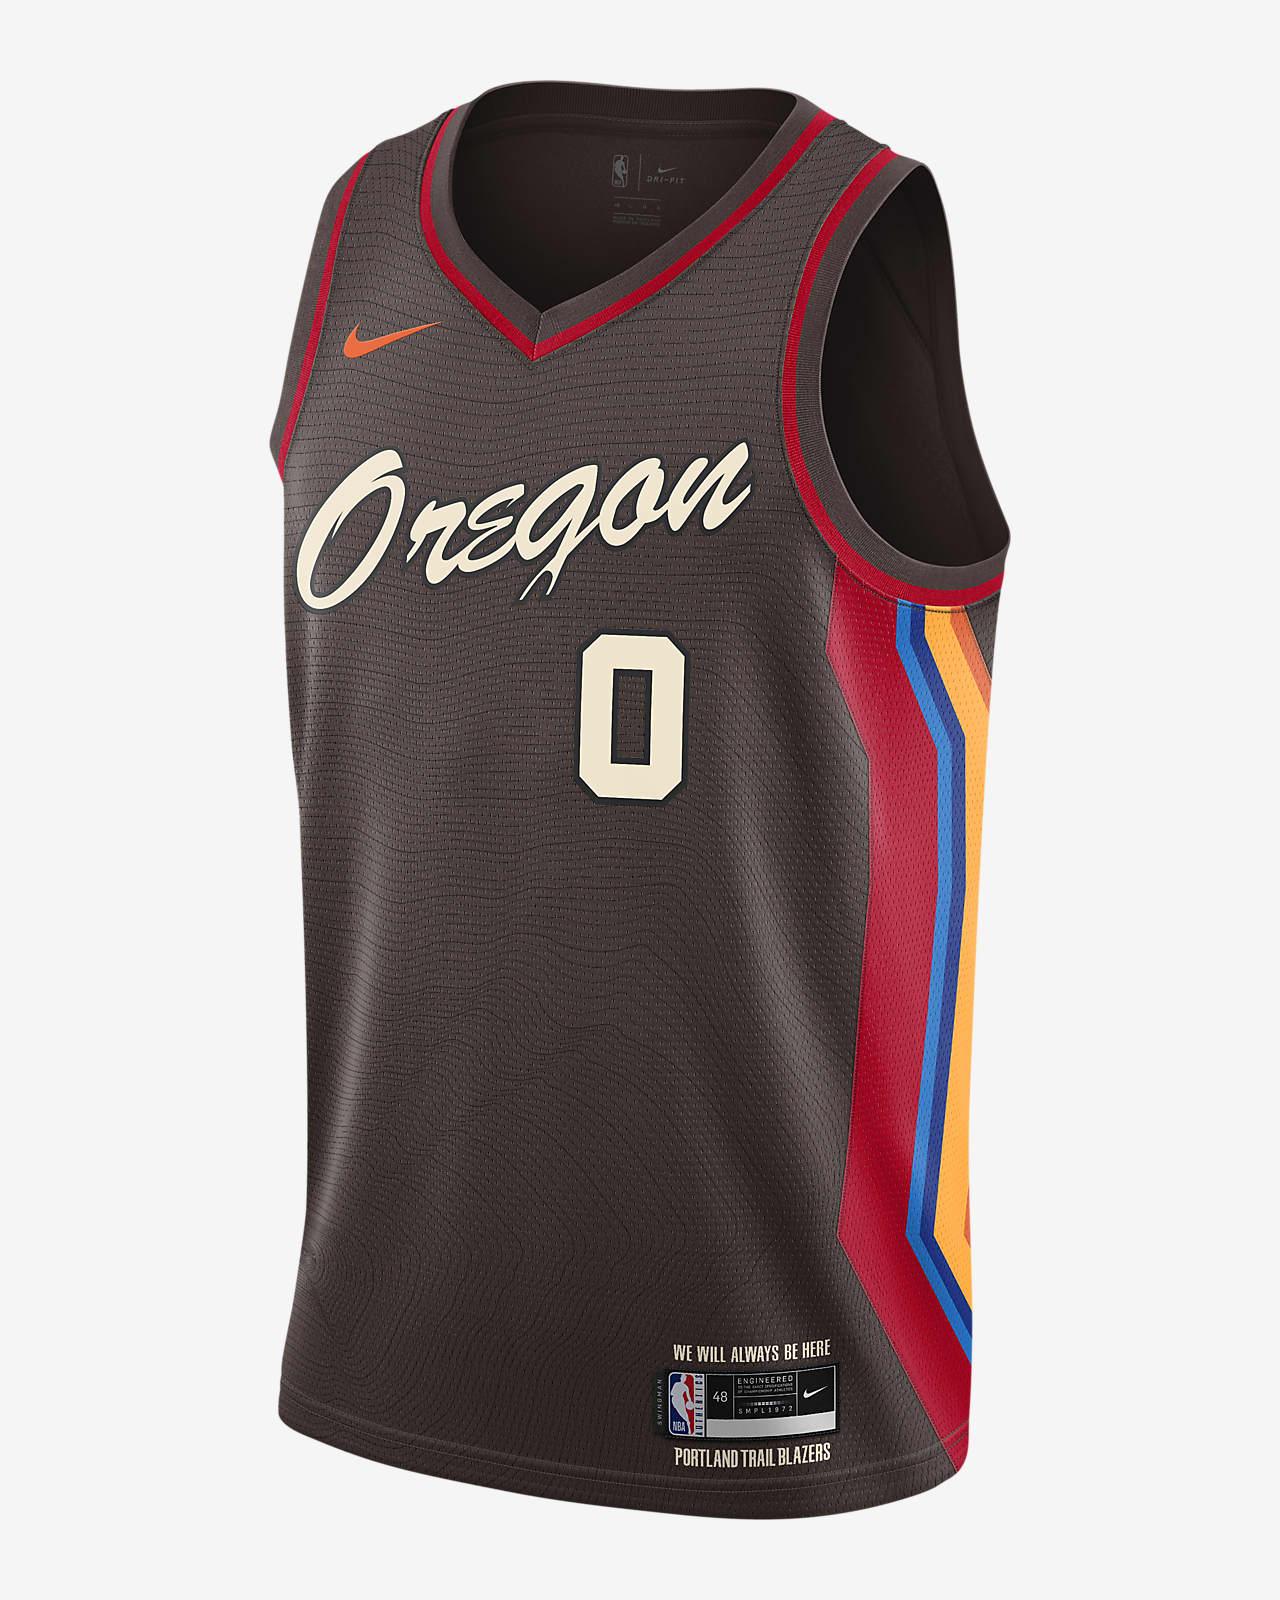 Portland Trail Blazers City Edition Nike NBA Swingman Jersey